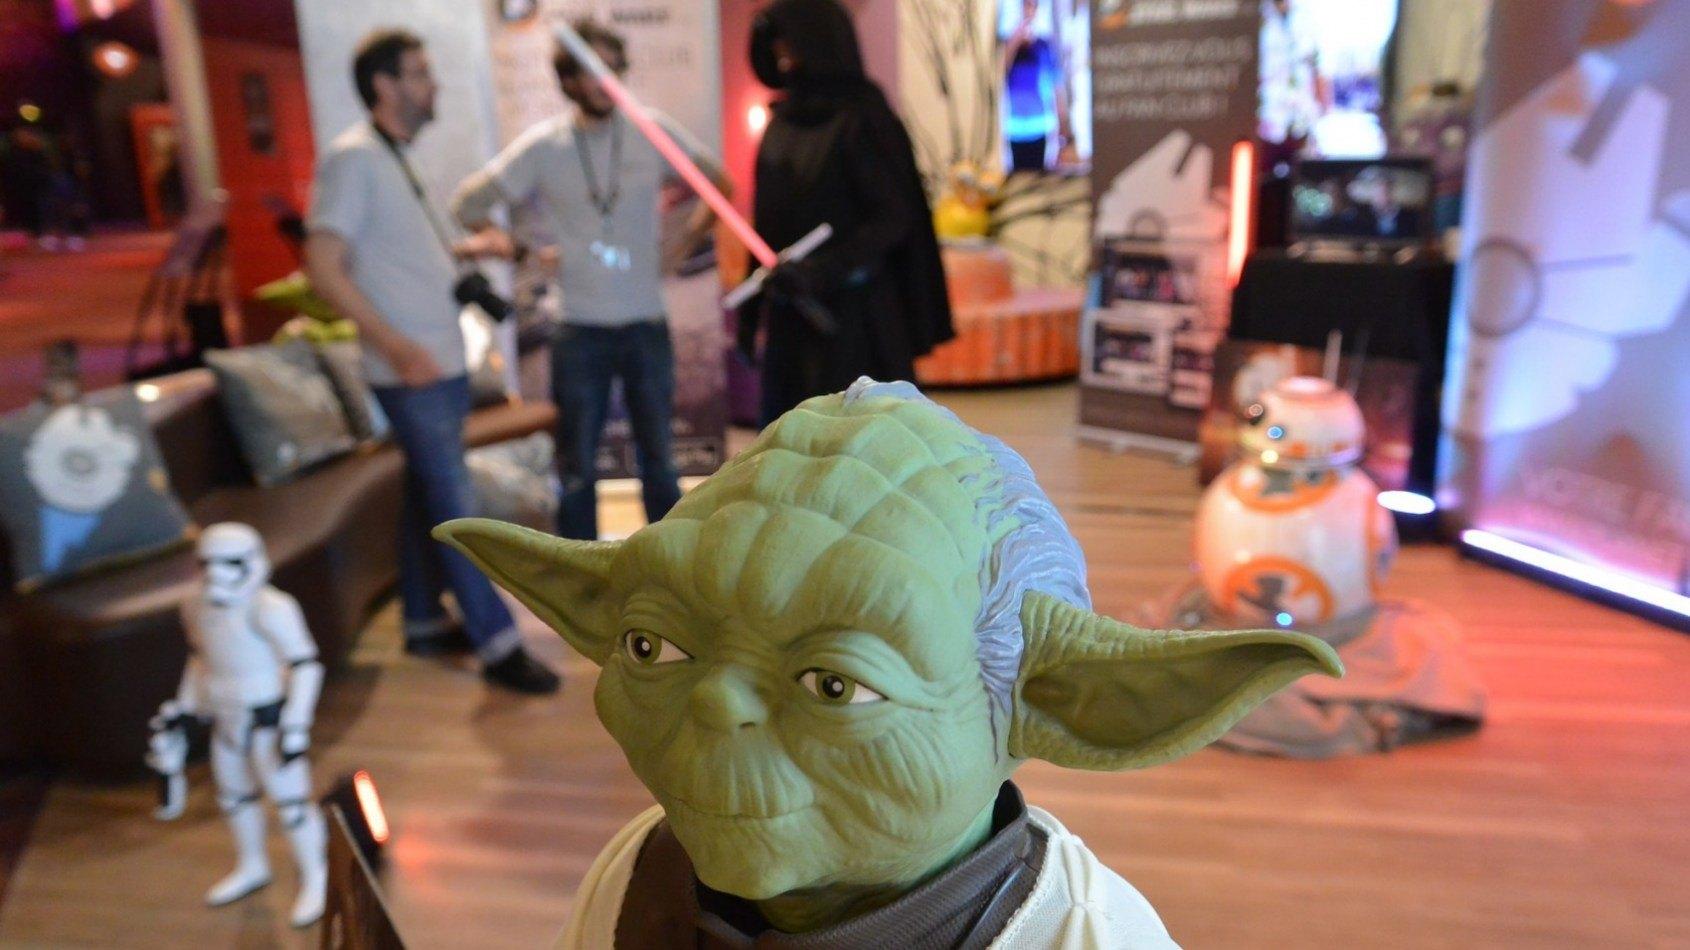 Soirée Star Wars et stand PSW - MintInBox en vidéo